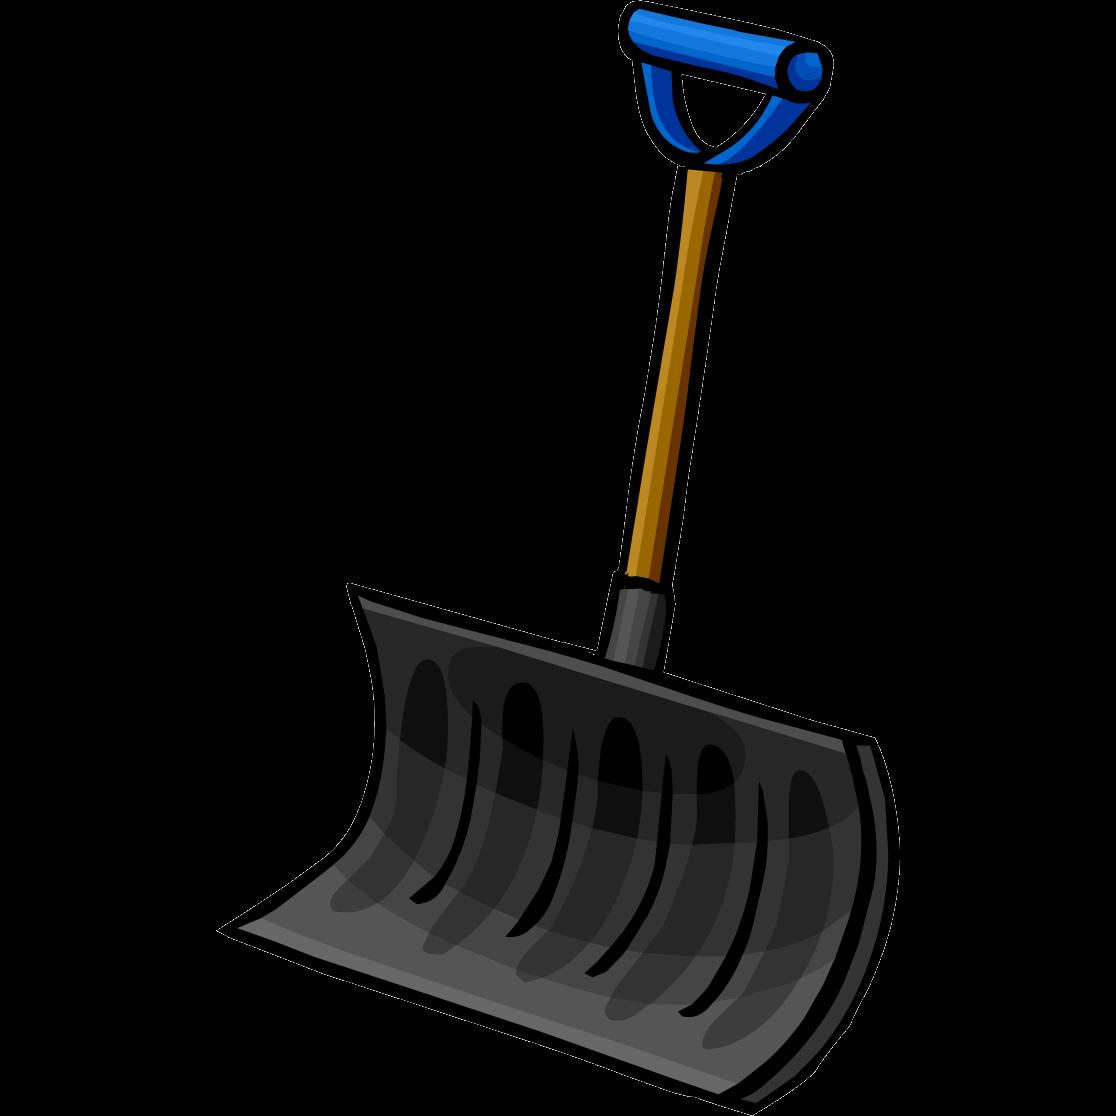 shoveling snow clipart free - photo #6